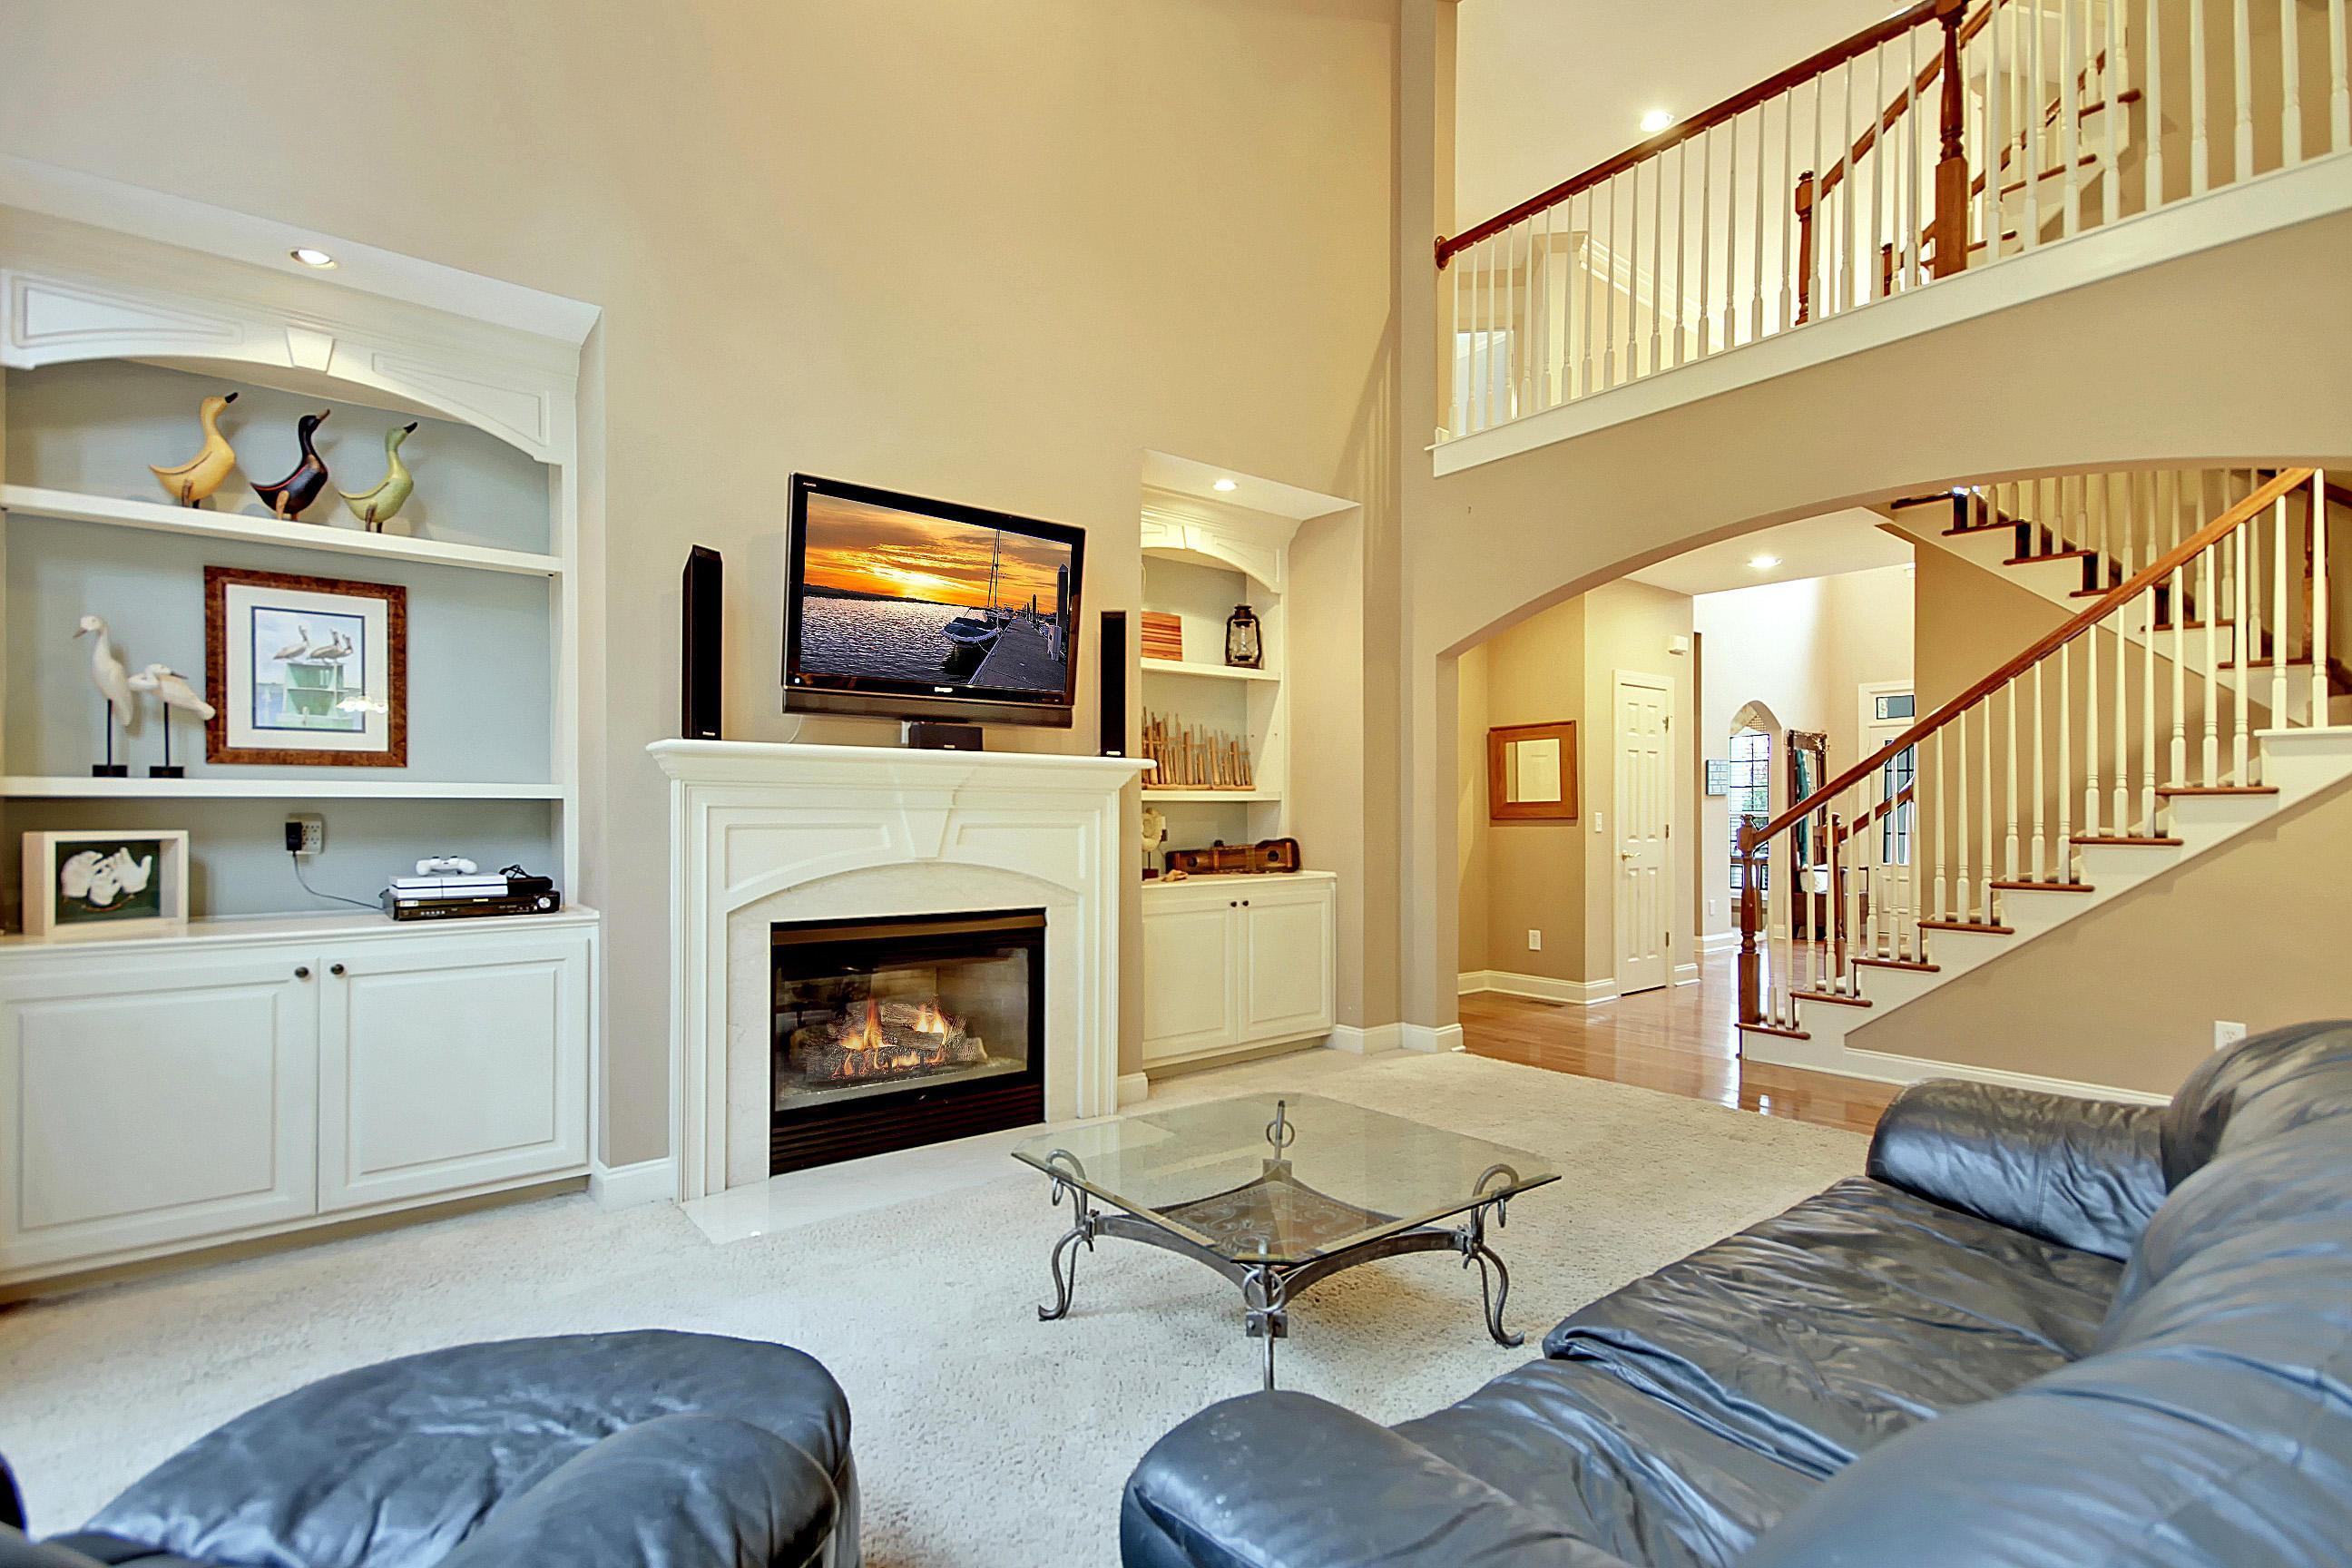 Dunes West Homes For Sale - 2449 Darts Cove, Mount Pleasant, SC - 4